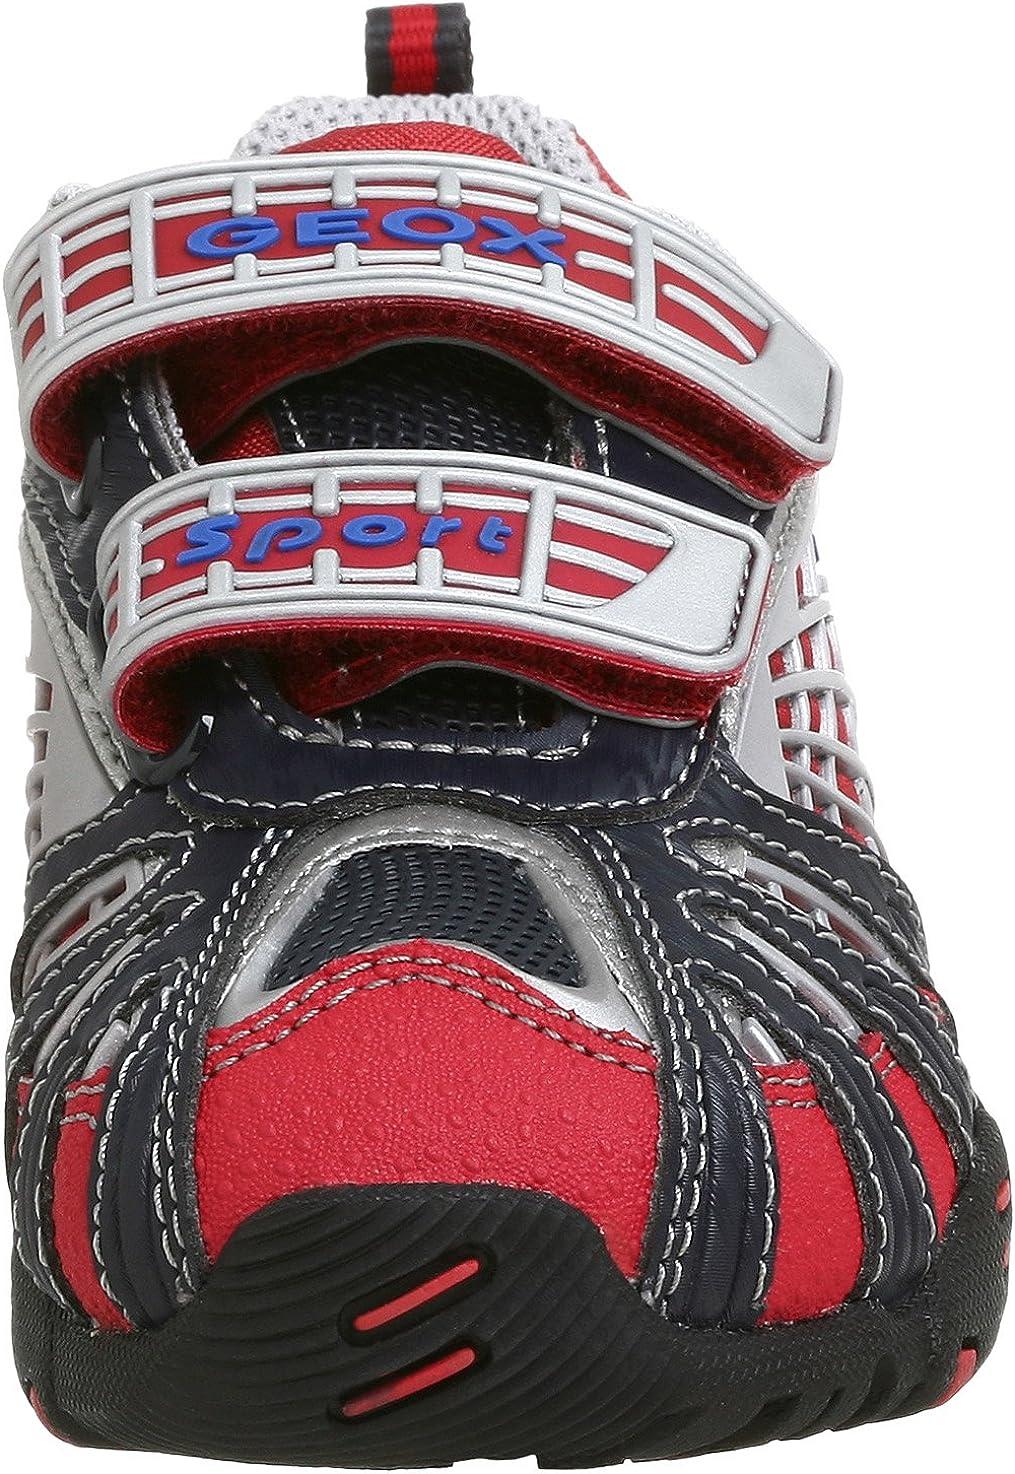 Geox Toddler//Little Kid Light Eclipse Sneaker